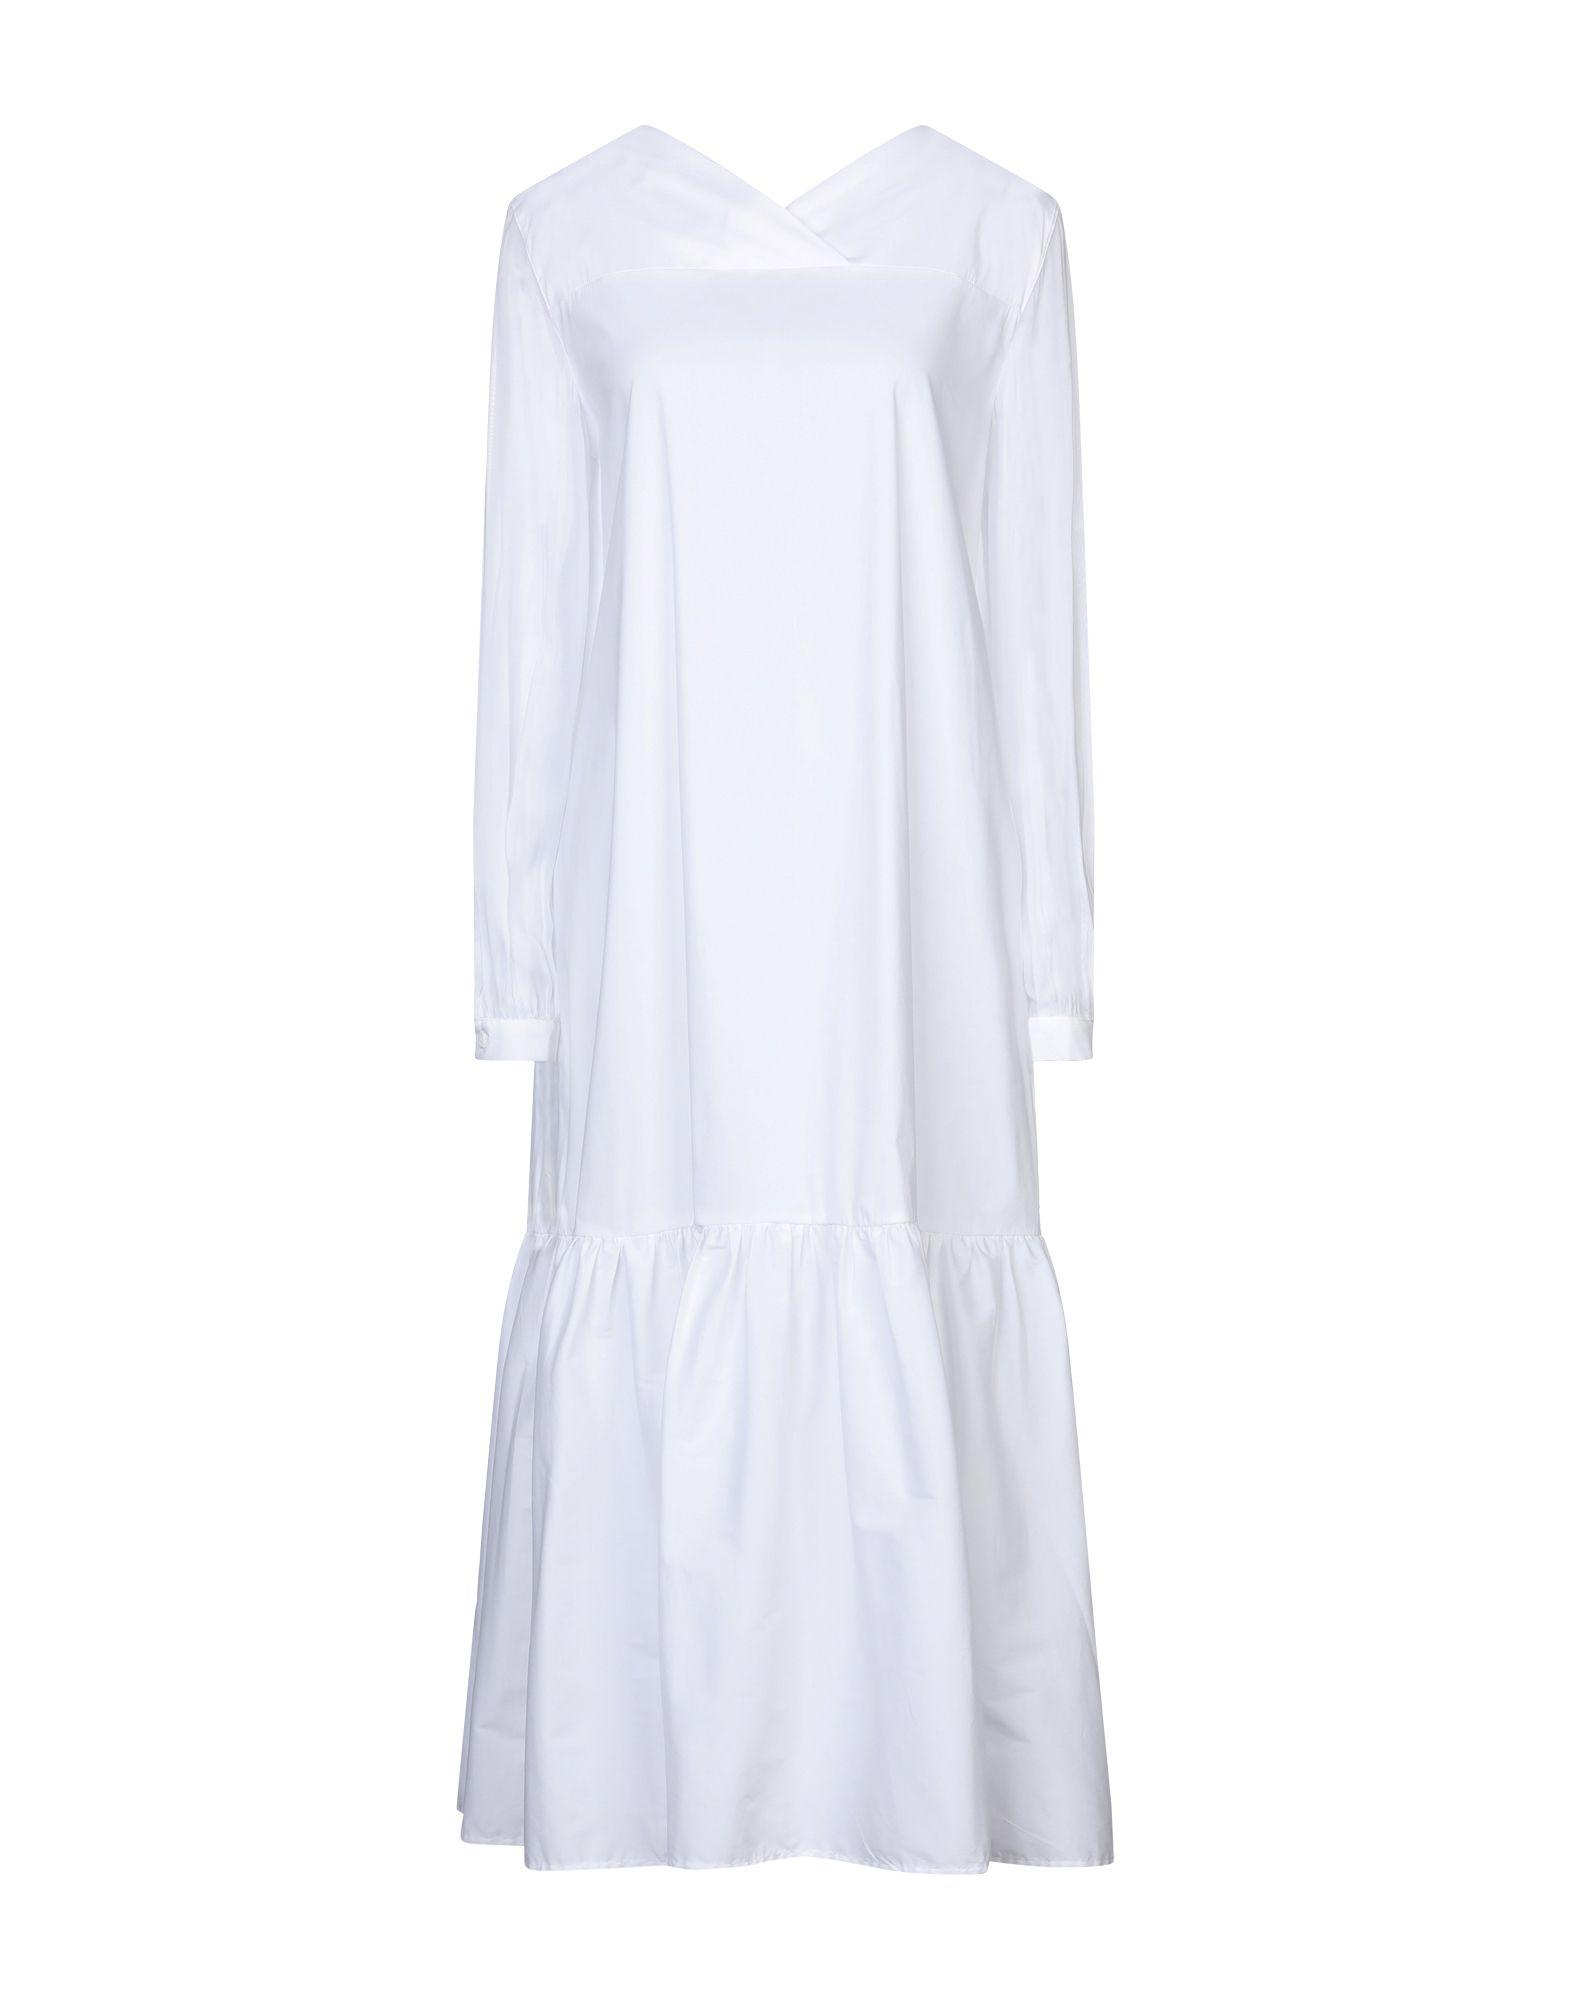 LIVIANA CONTI Платье длиной 3/4